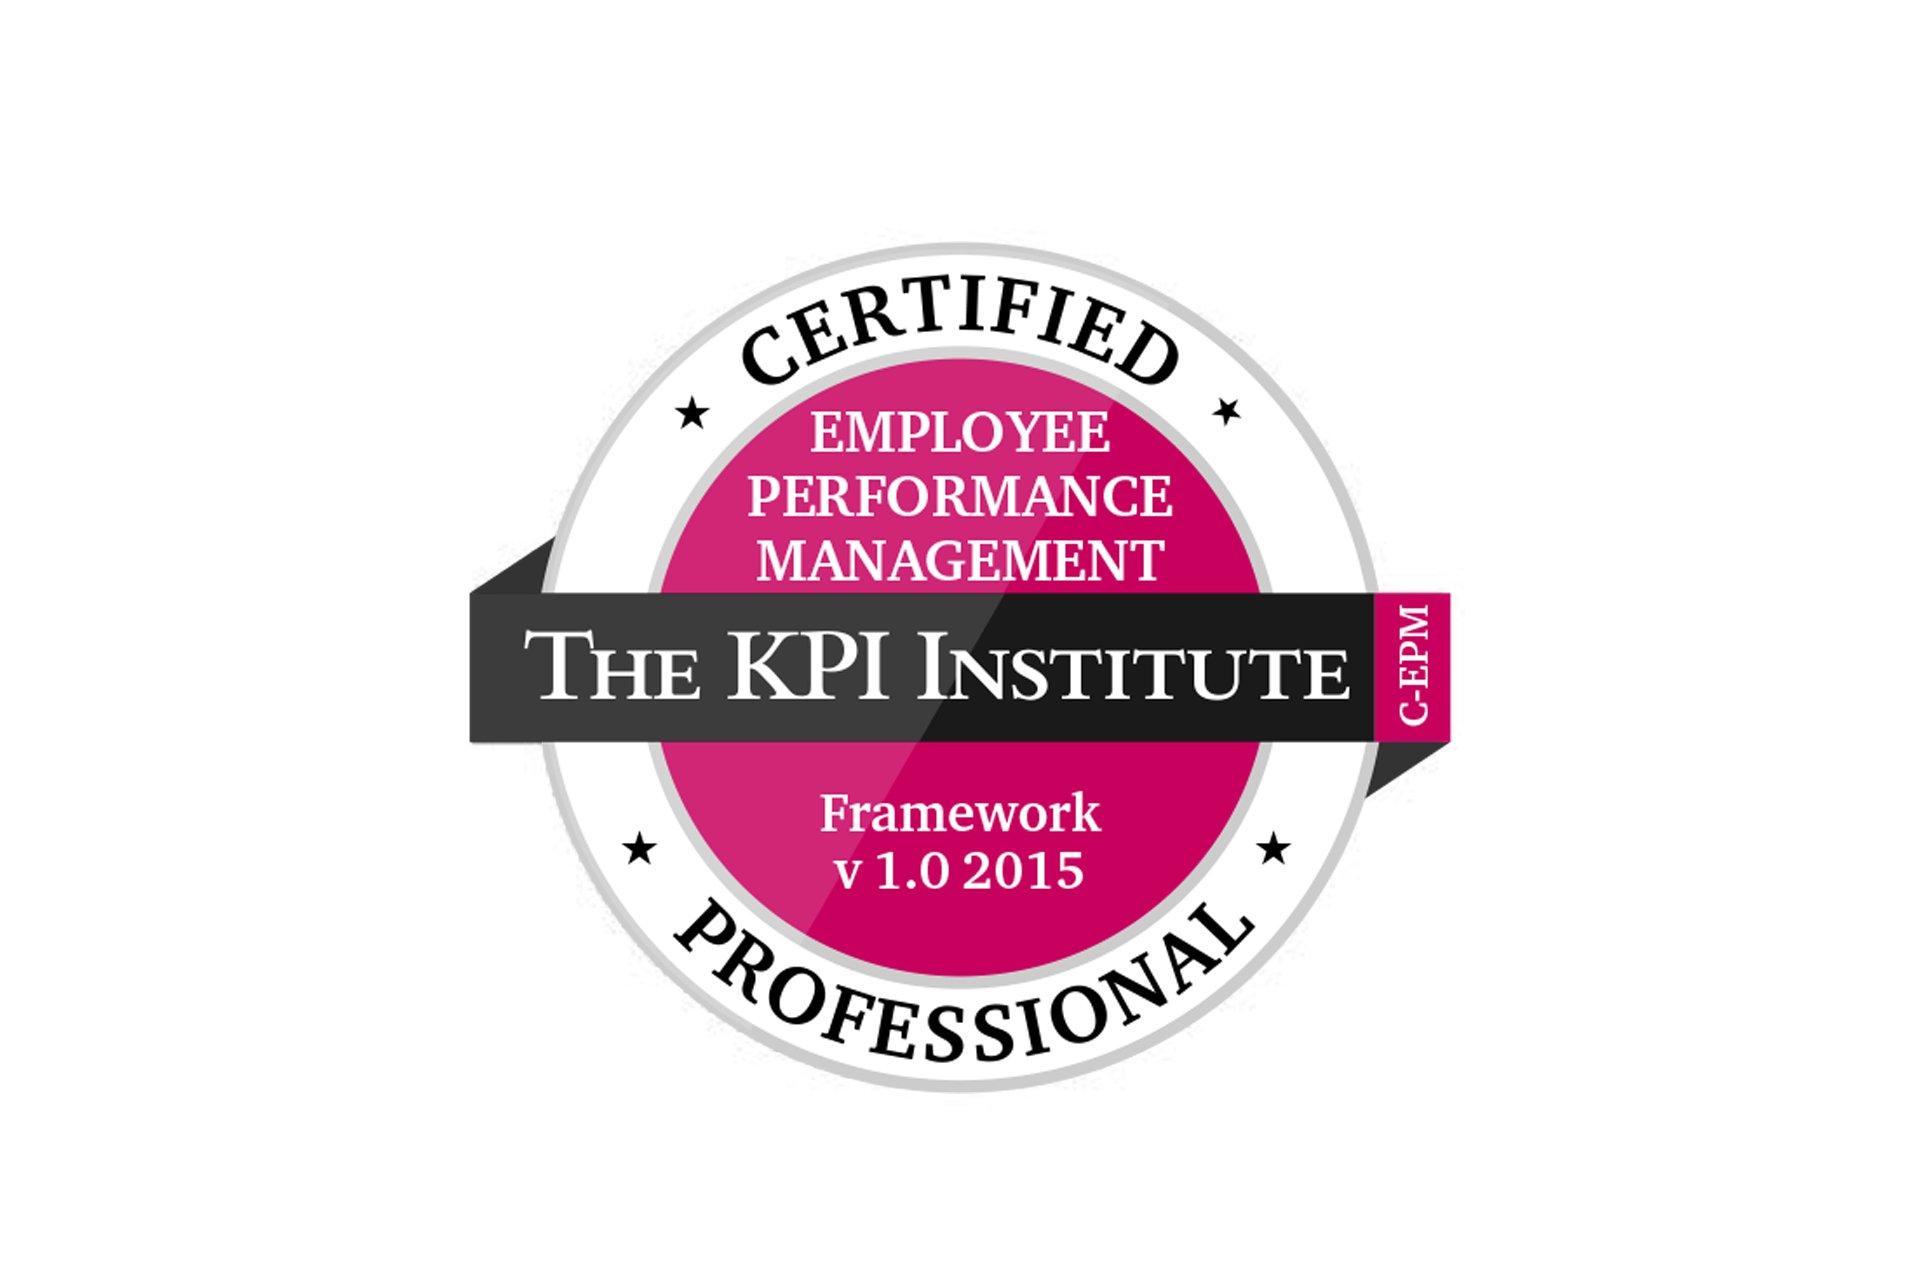 Certified Employee Performance Management Professional сургалт